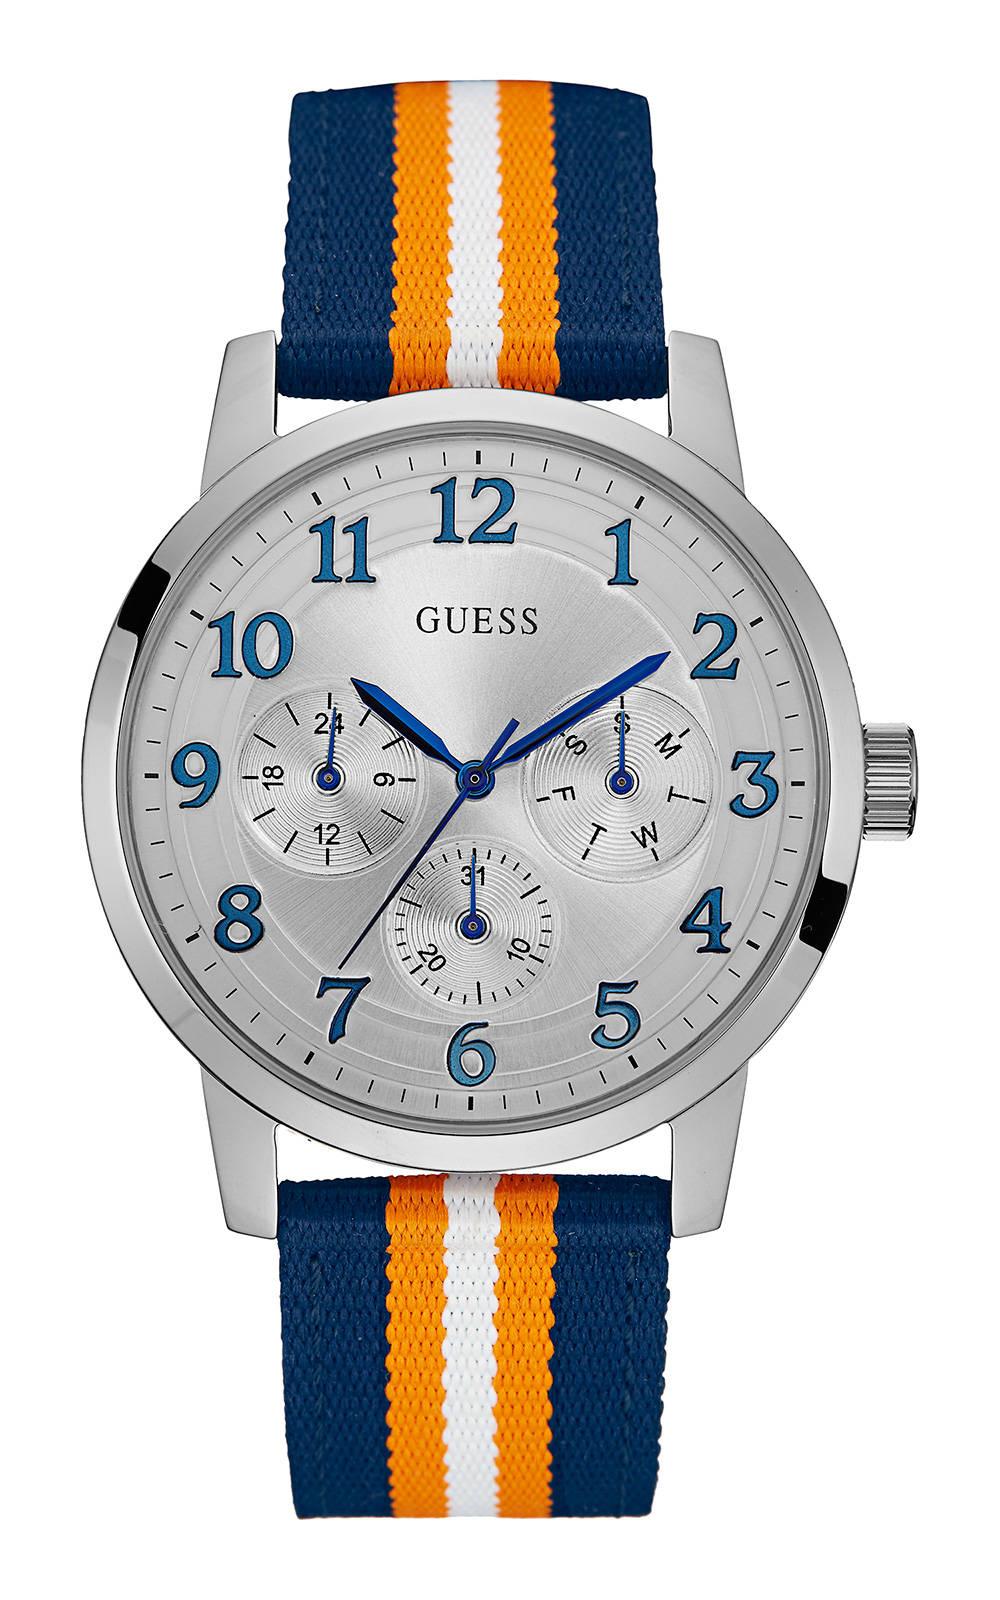 GUESS W0975G2 Ανδρικό Ρολόι Quartz Multi-Function